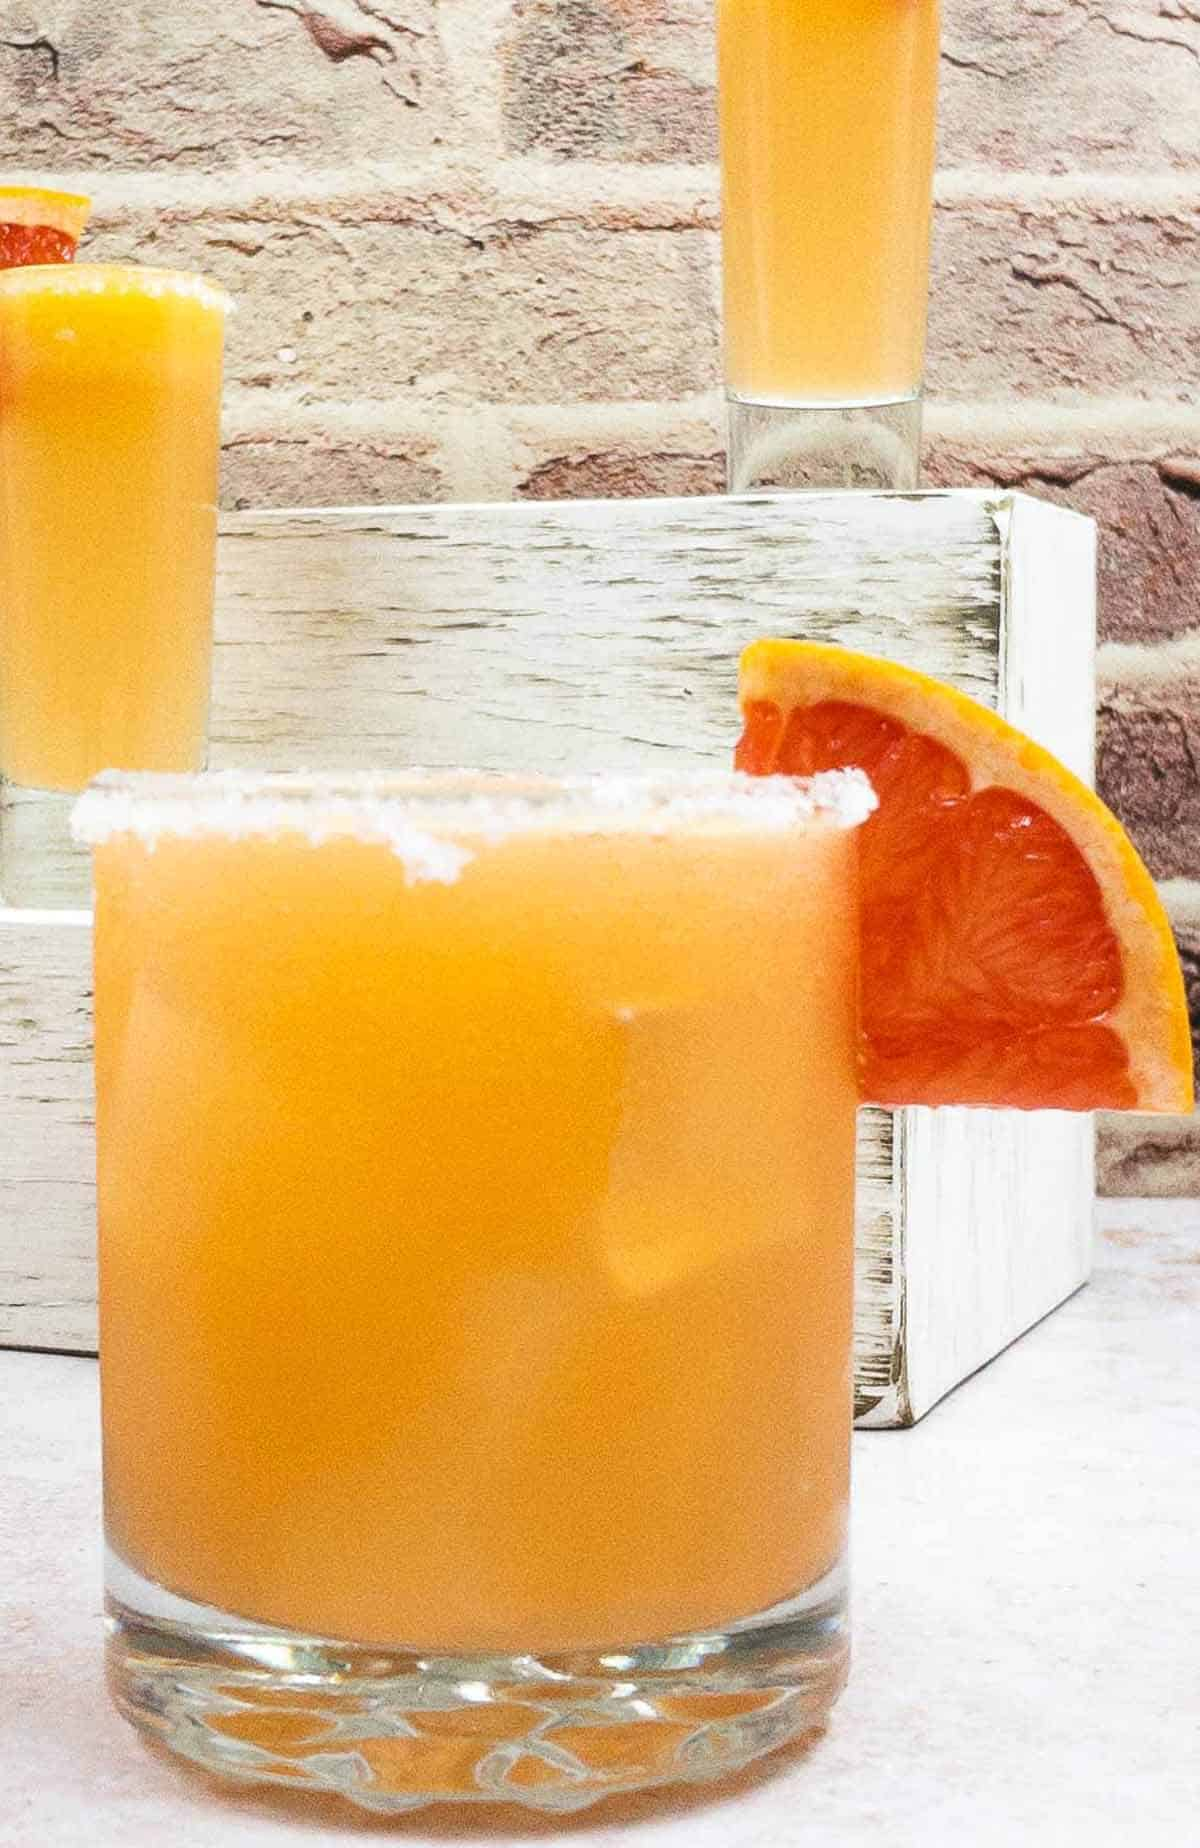 Paloma cocktail with fresh slice of grapefruit.